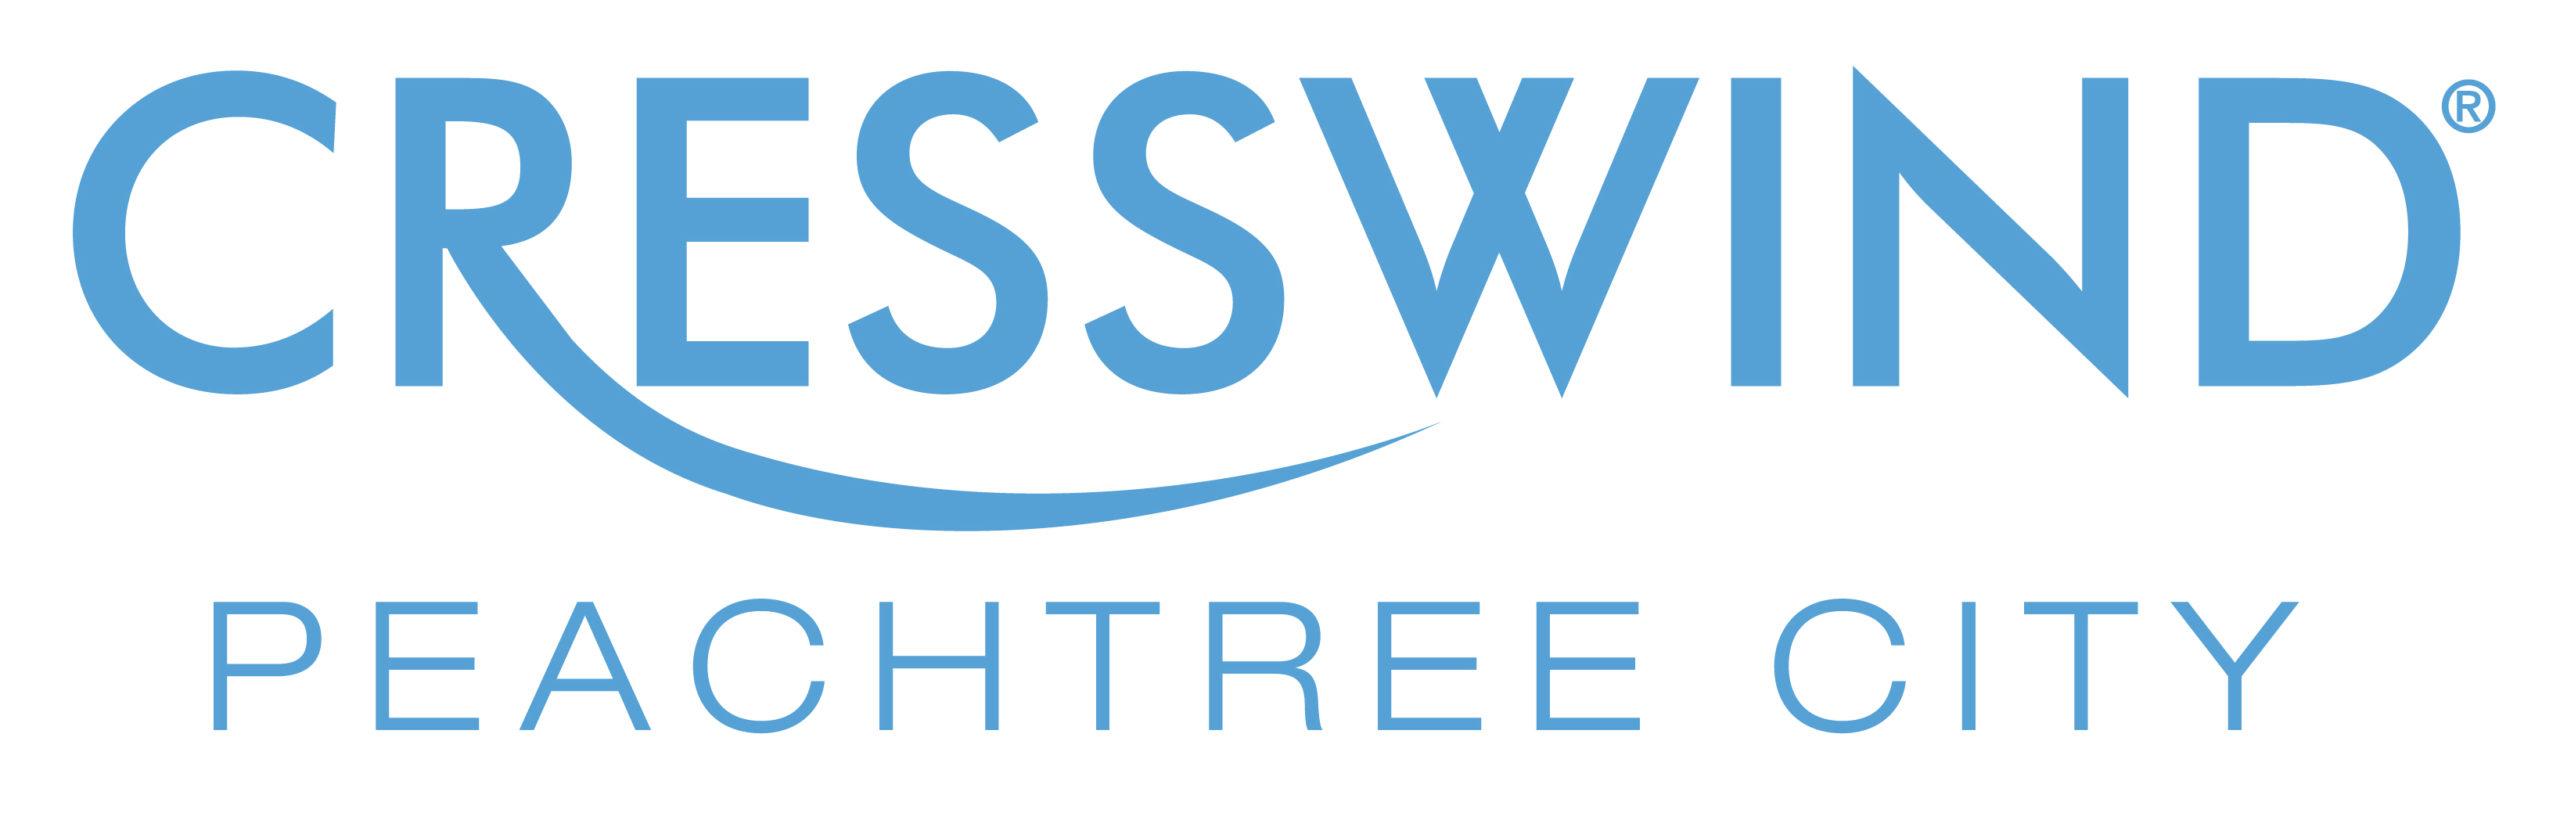 cresswind-peachtree-city (16)